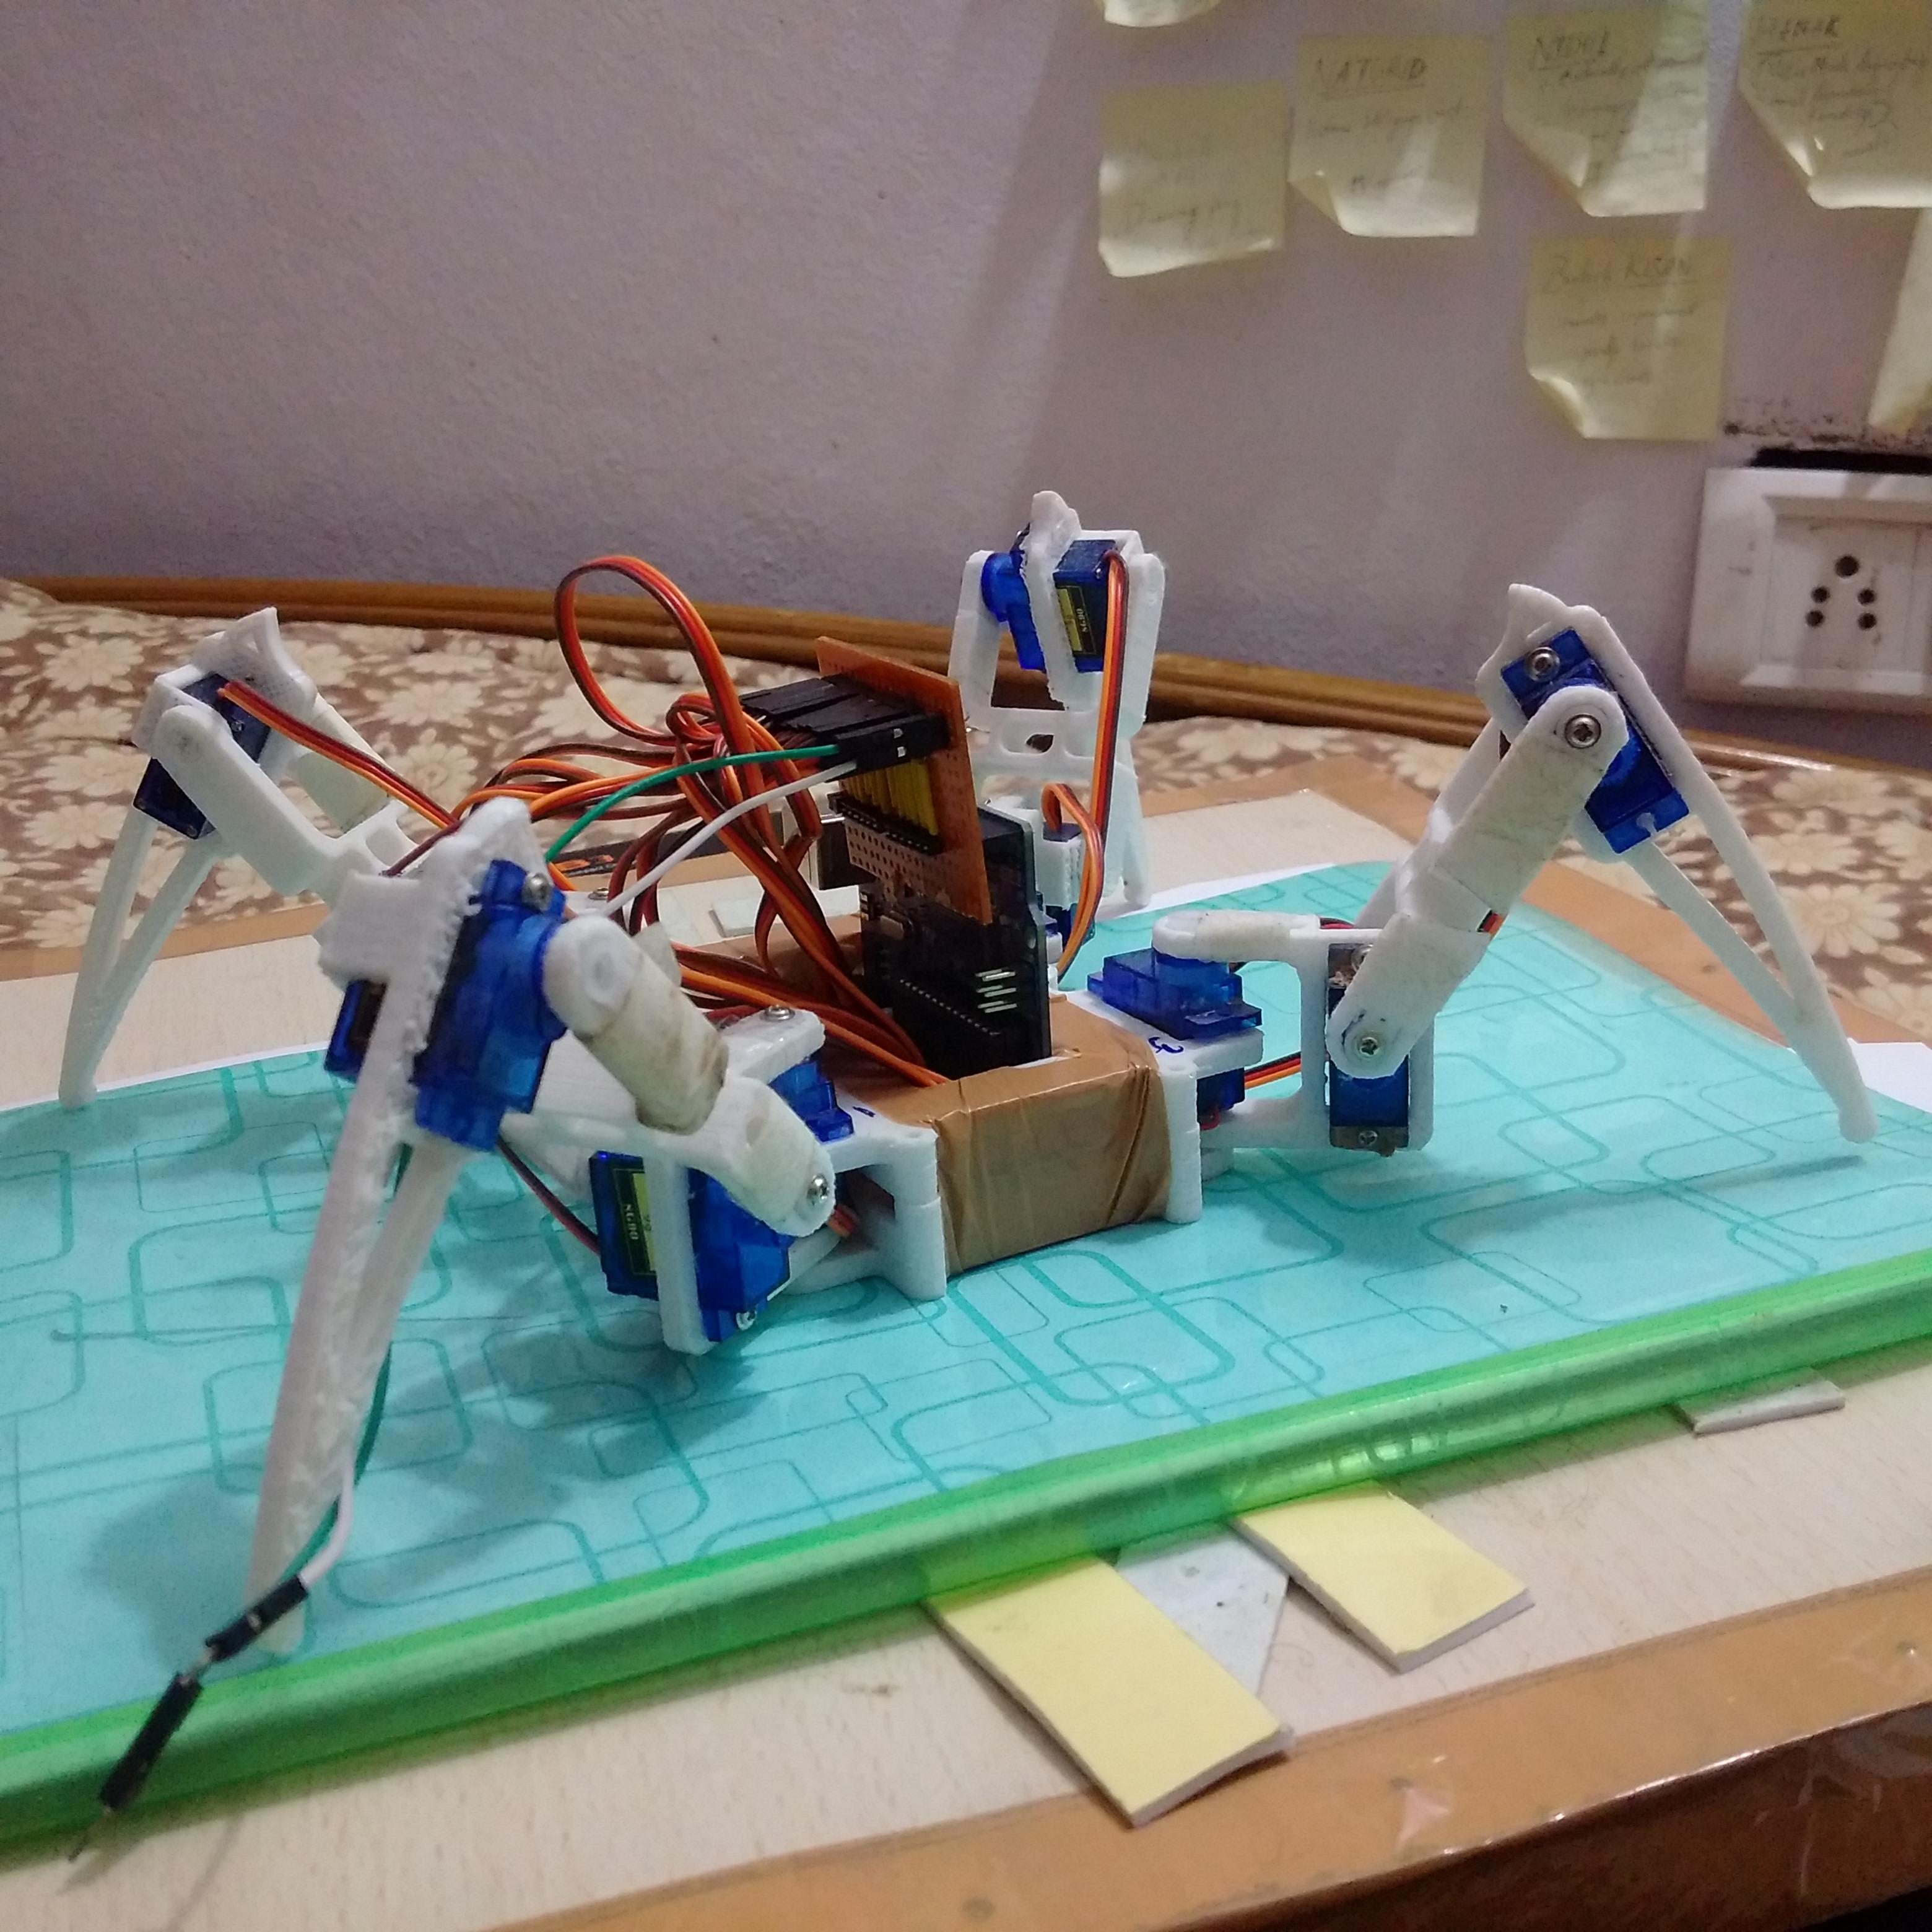 [DIY] Spider Robot(Quad Robot, Quadruped)